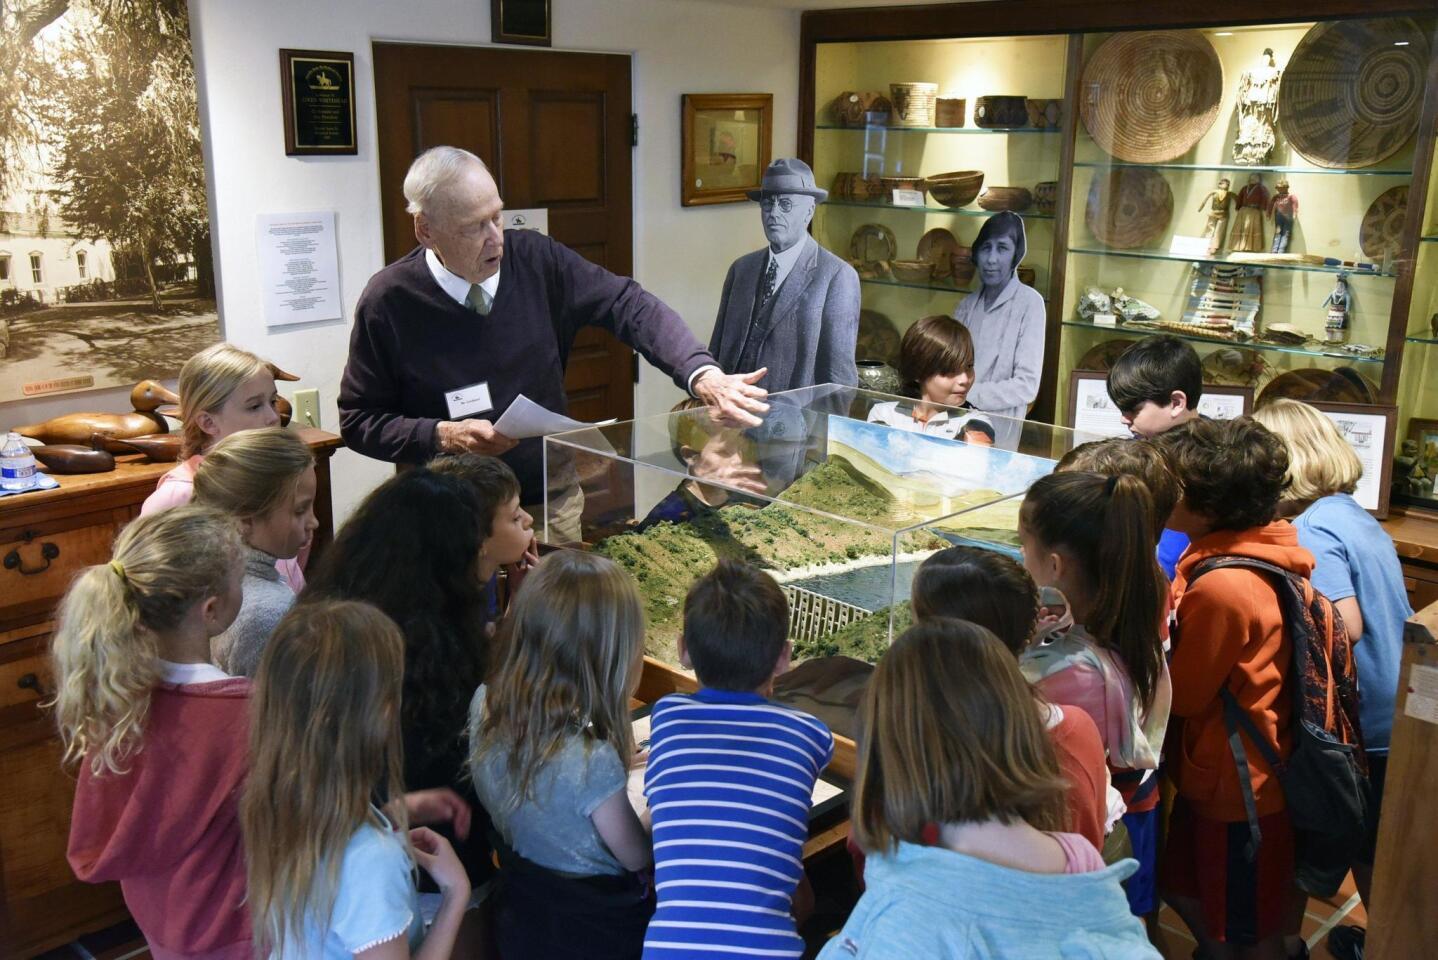 Board member/landscape artist Roger Lindland tells the story of the Lake Hodges Dam